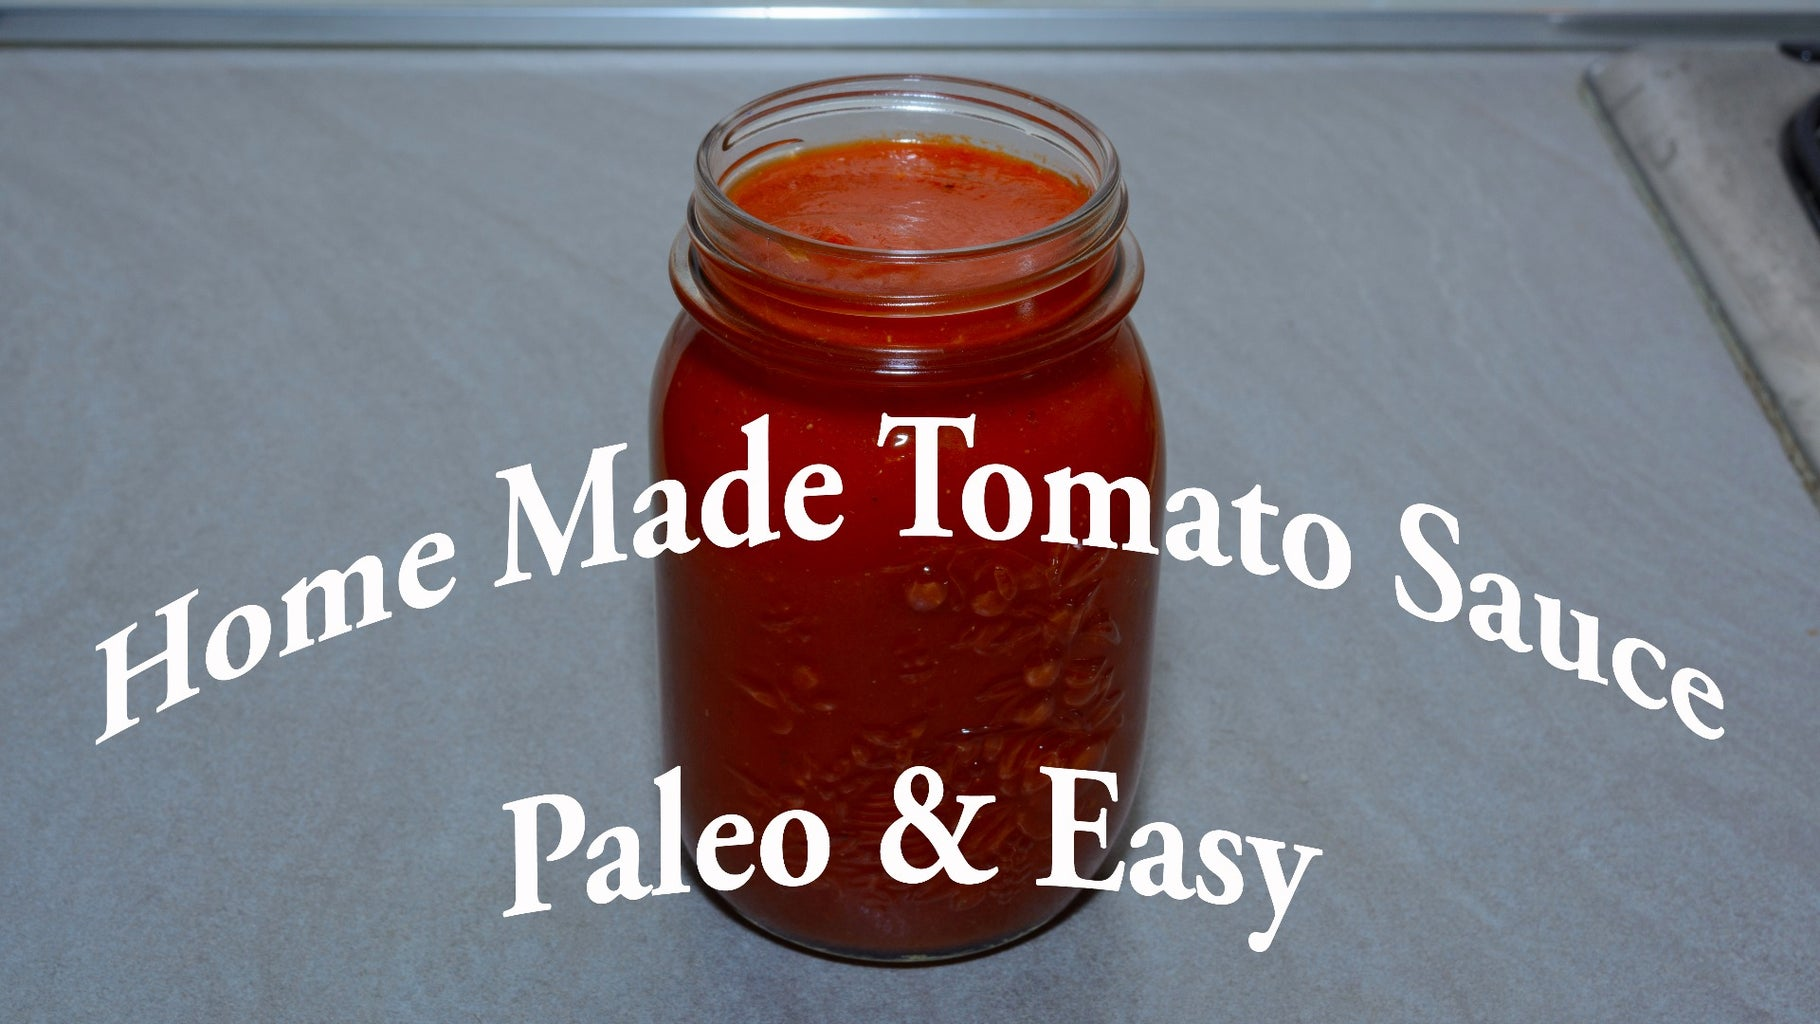 Homemade Tomato Sauce Paleo